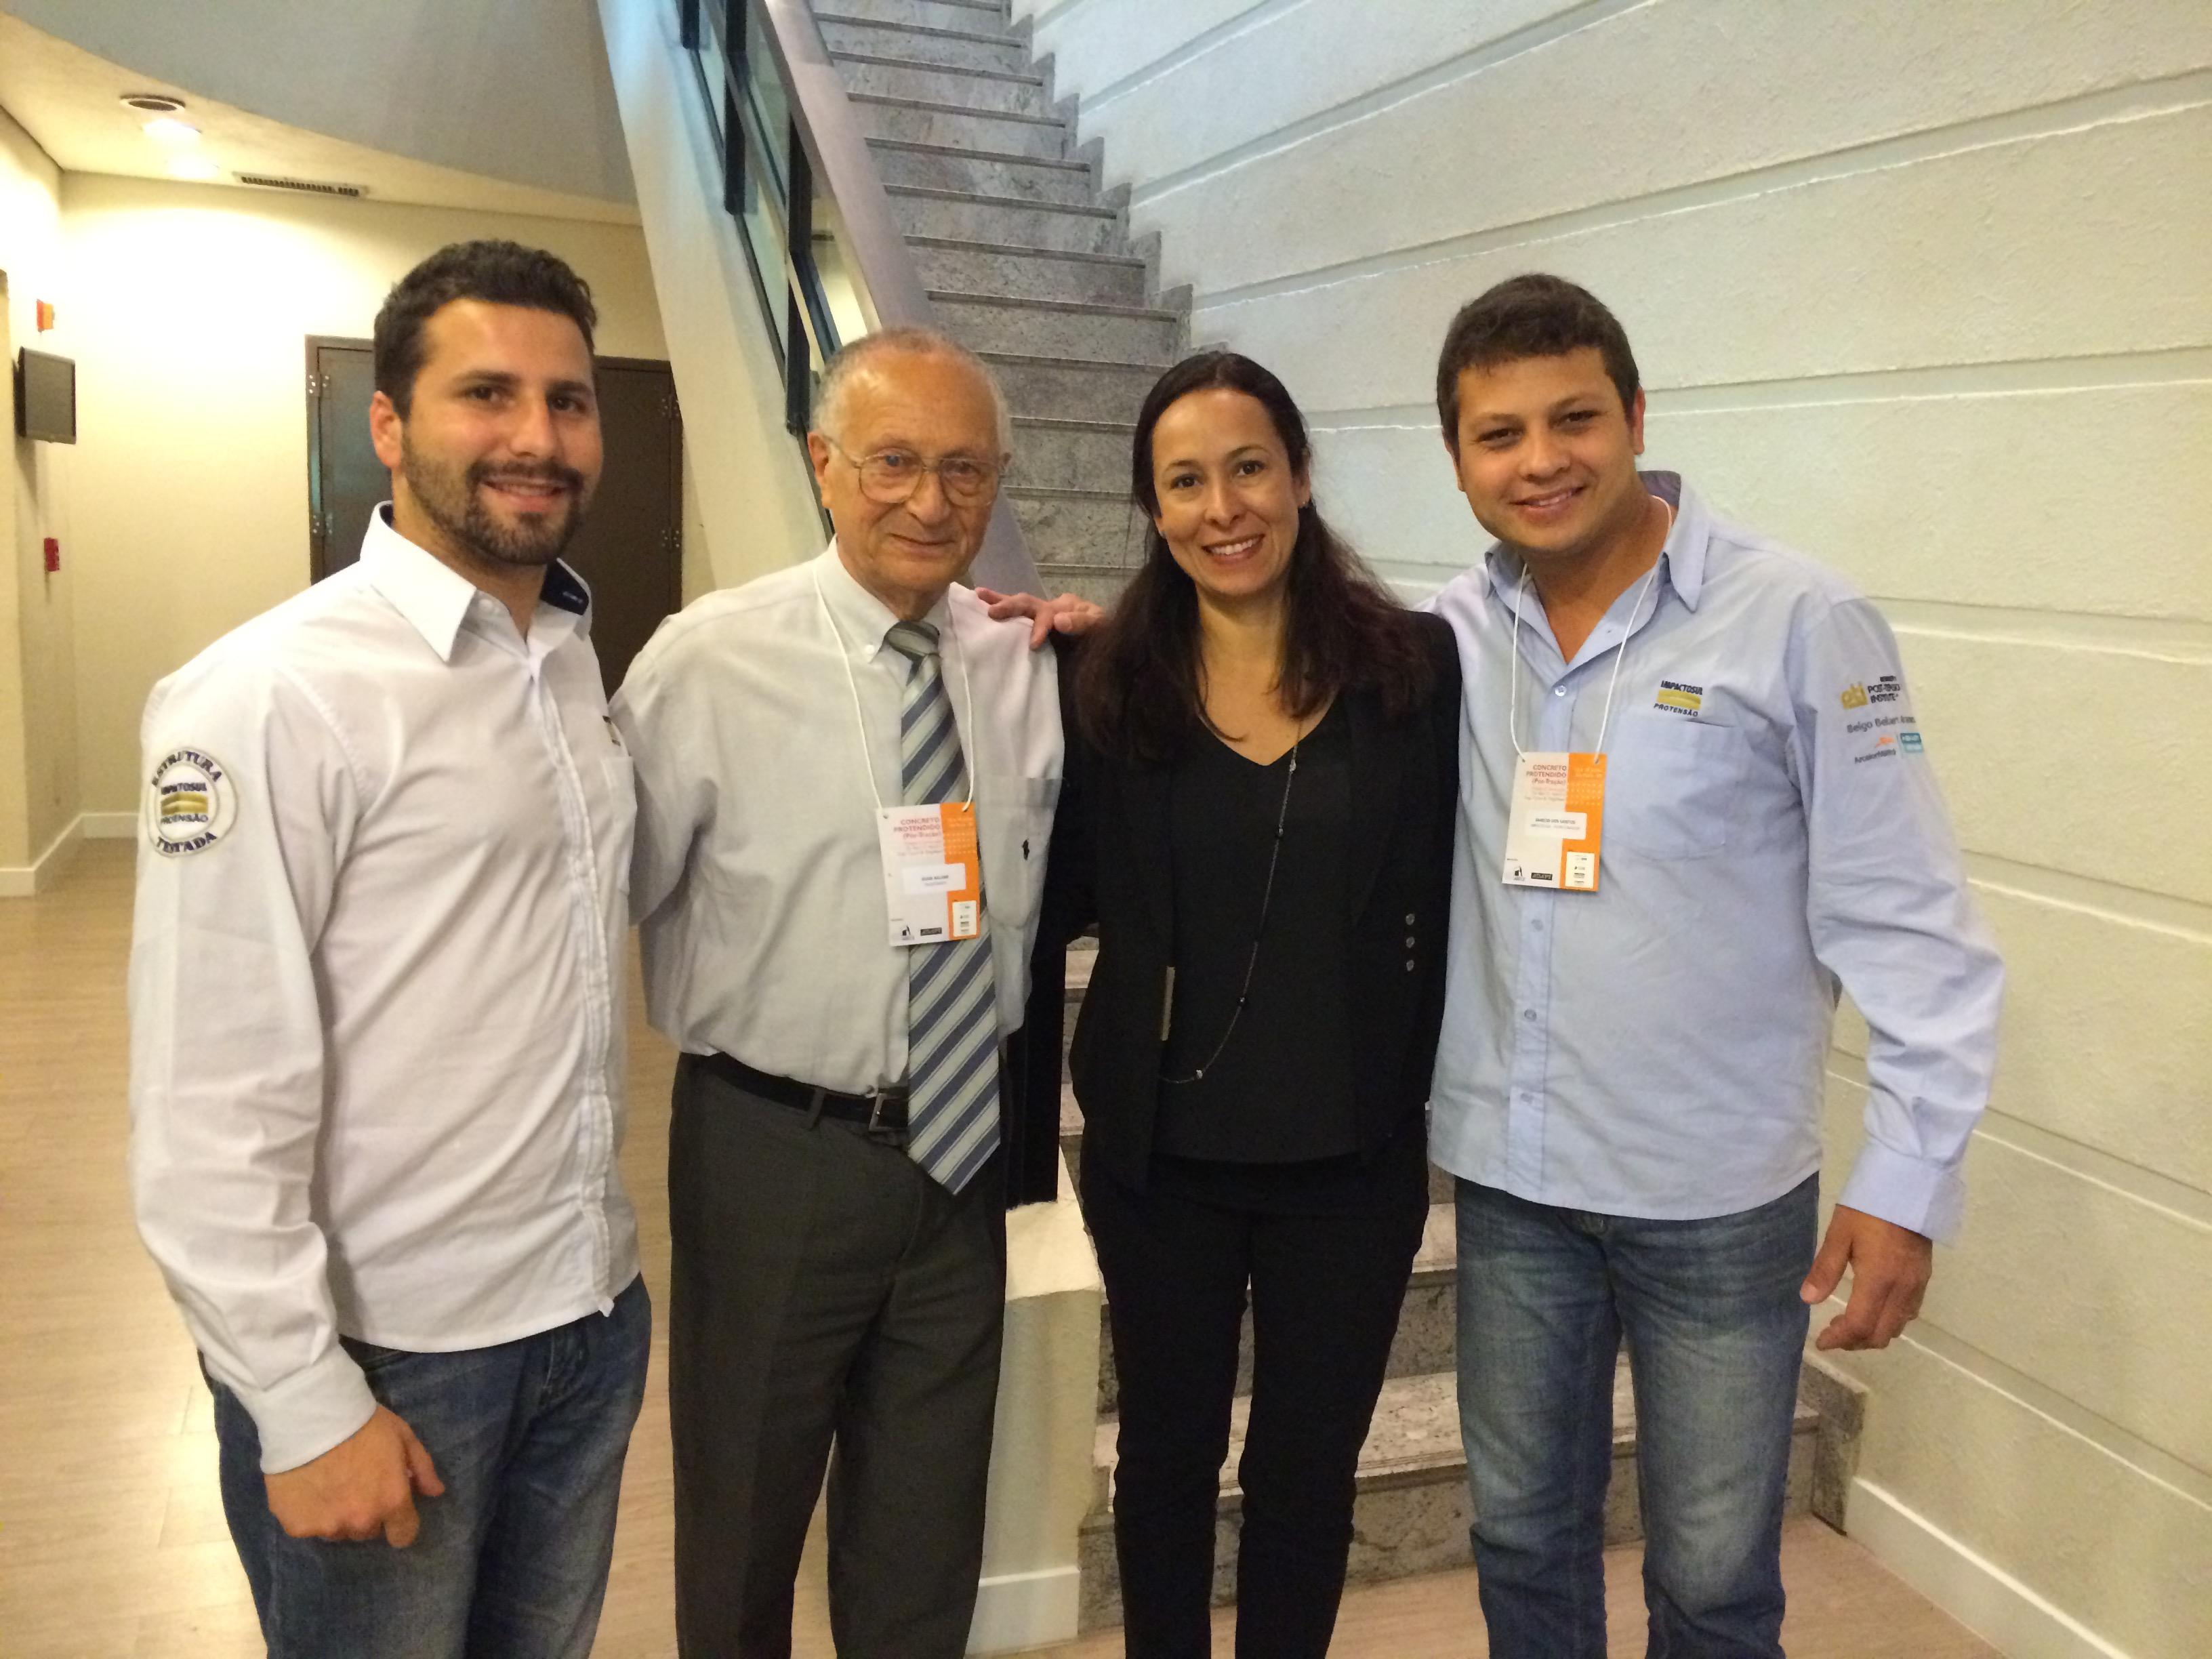 Alex M. Schonemborn, Dr. Bijan Aalami, Carine Magalhães, Marcio dos Santos.